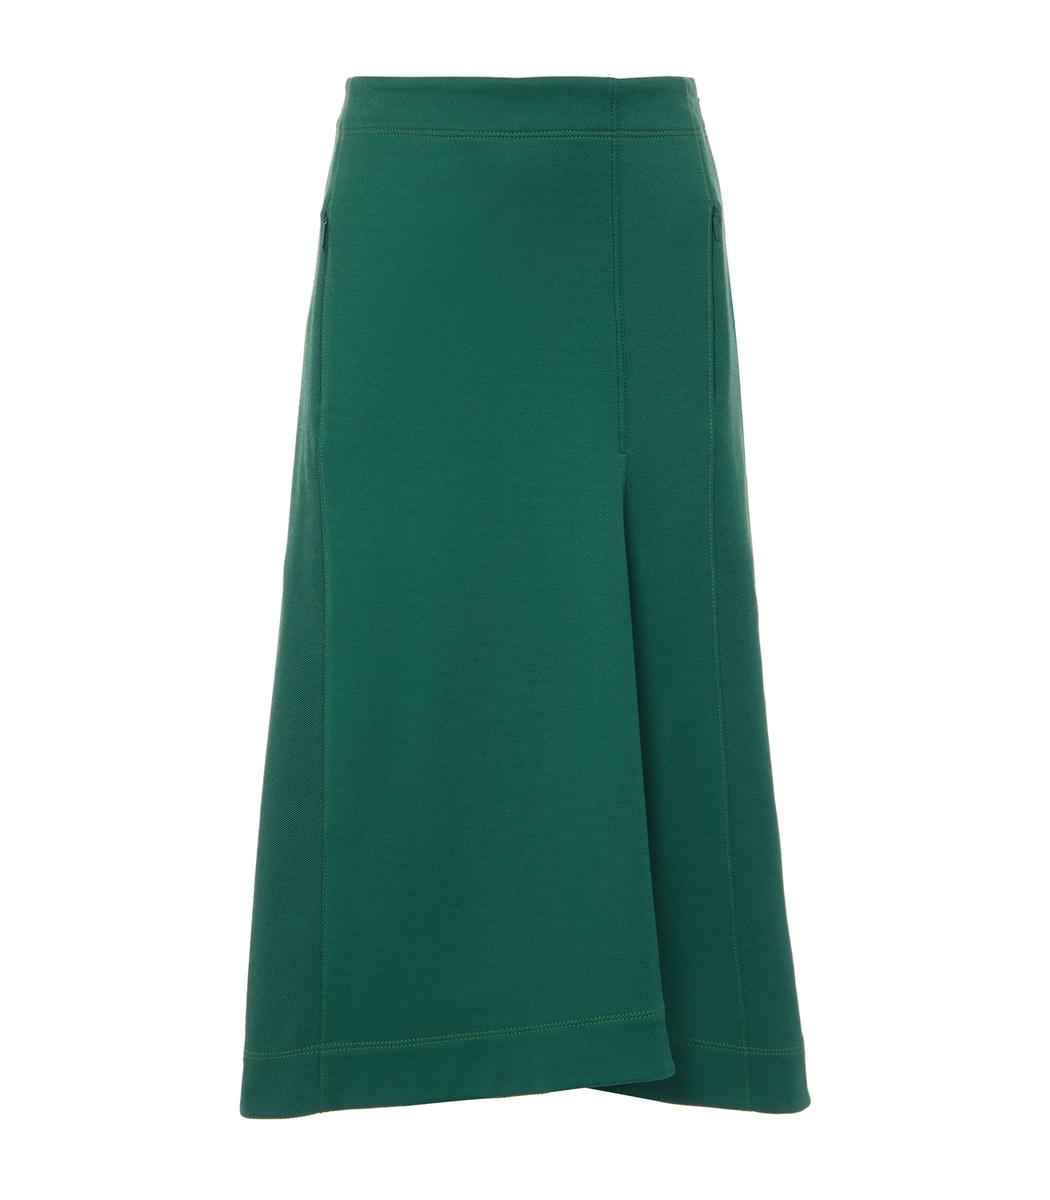 Tibi Cottons Dark Green Stretch Cavalry Twill Sculpted Skirt